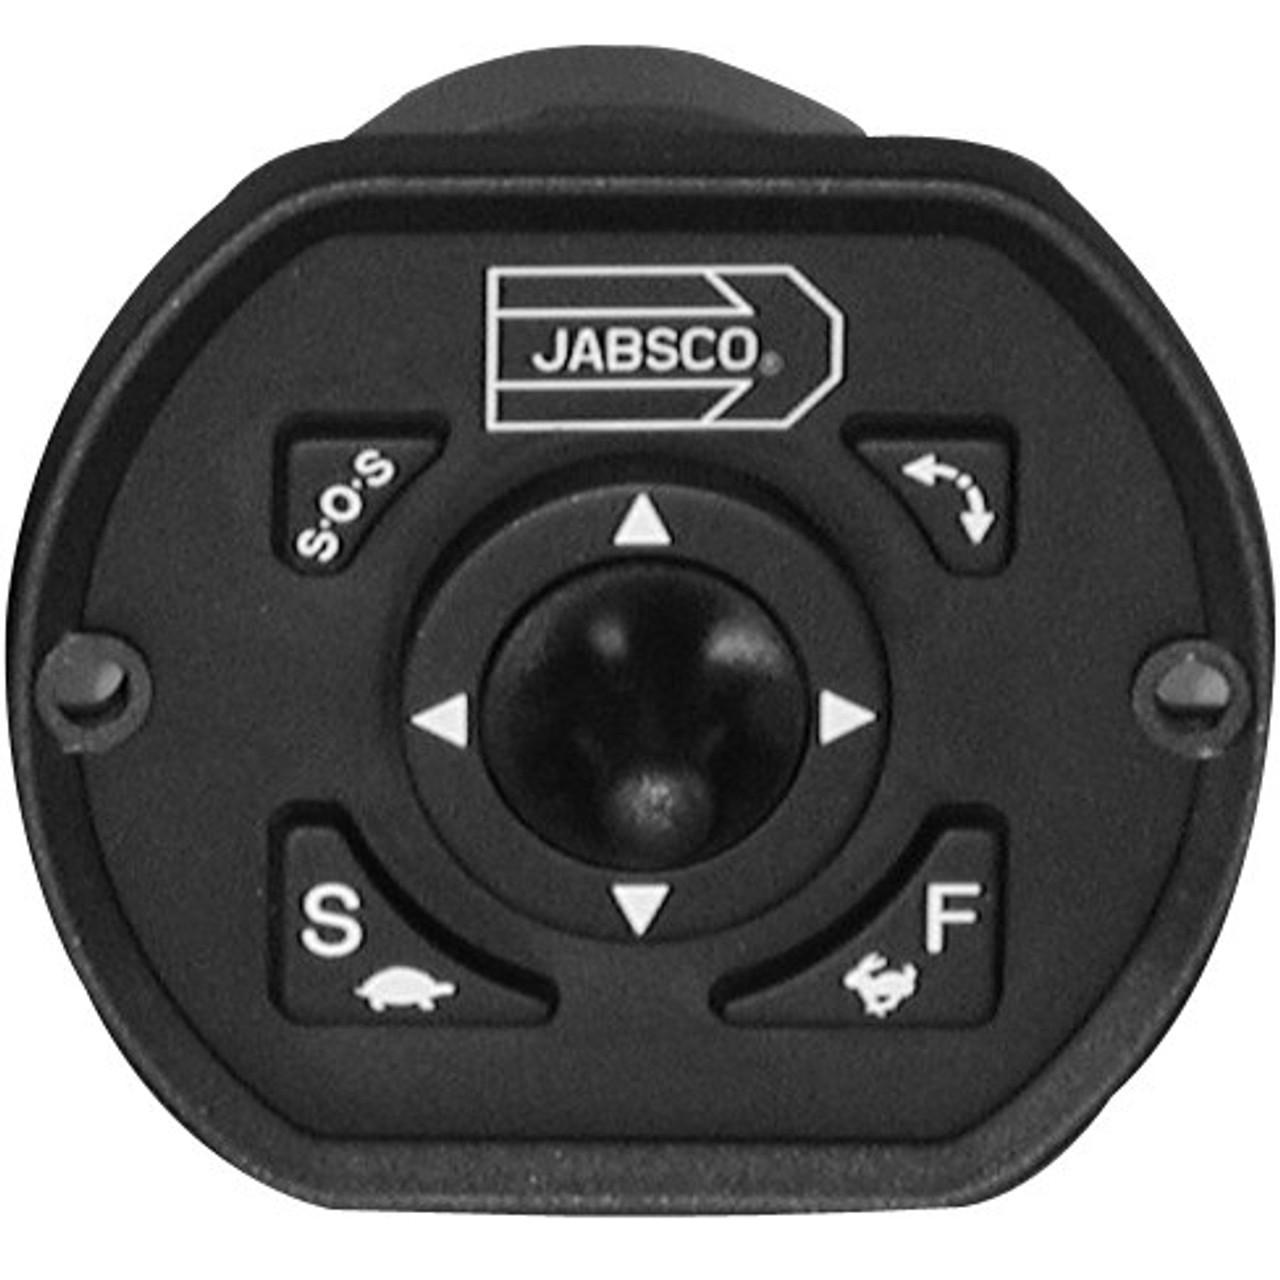 J65-133 Jabsco 43690-1000: Control Panel 155SL Deluxe